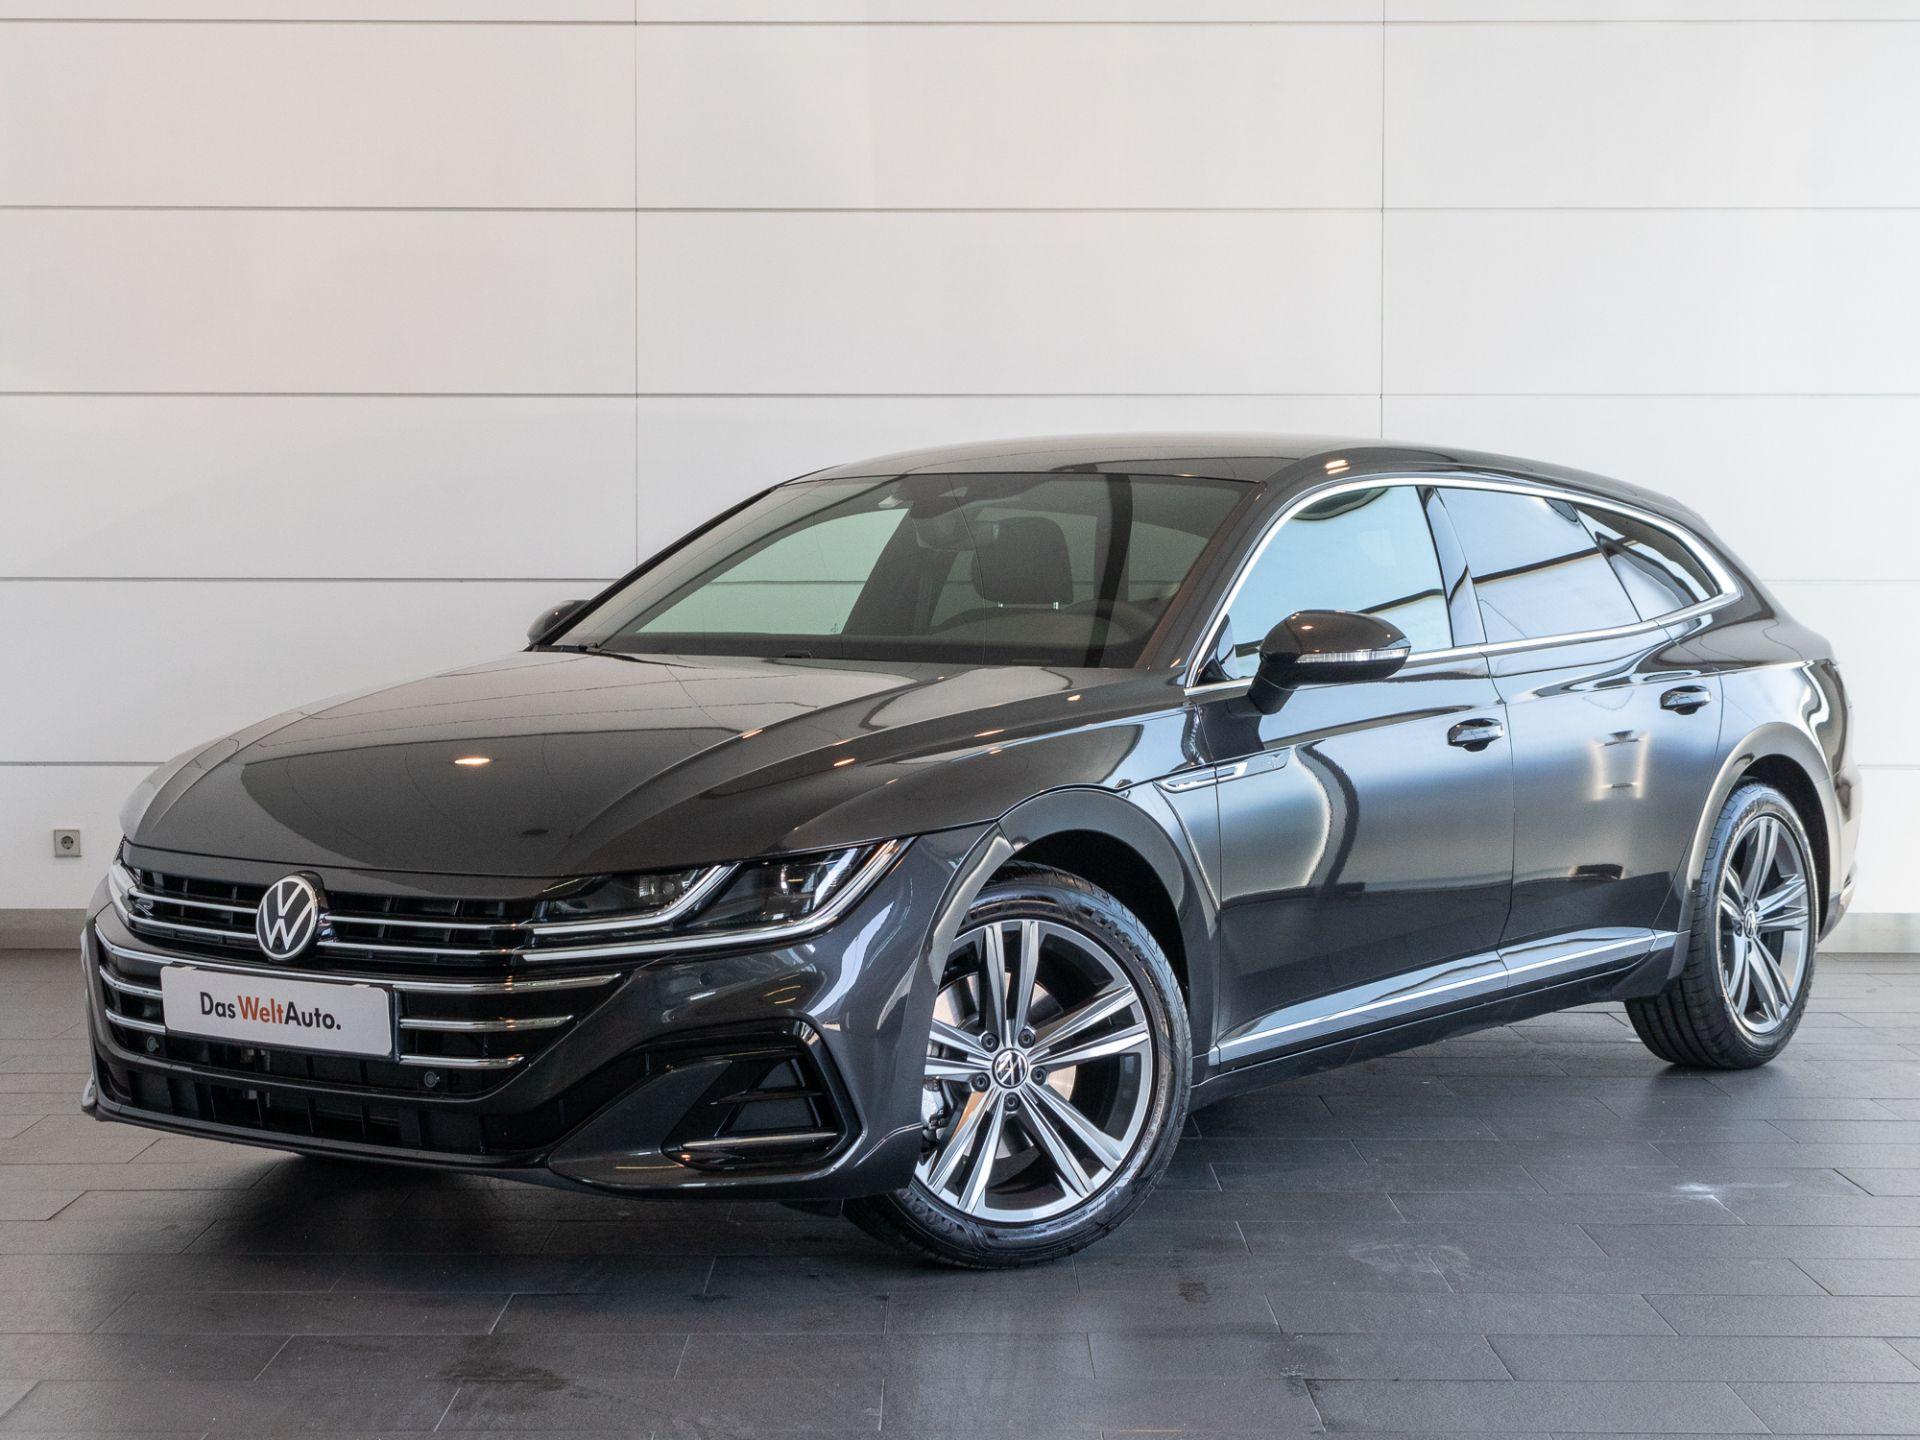 Volkswagen Arteon Arteon Shooting 2.0 TDI 150 cv DSG R-Line segunda mão Setúbal